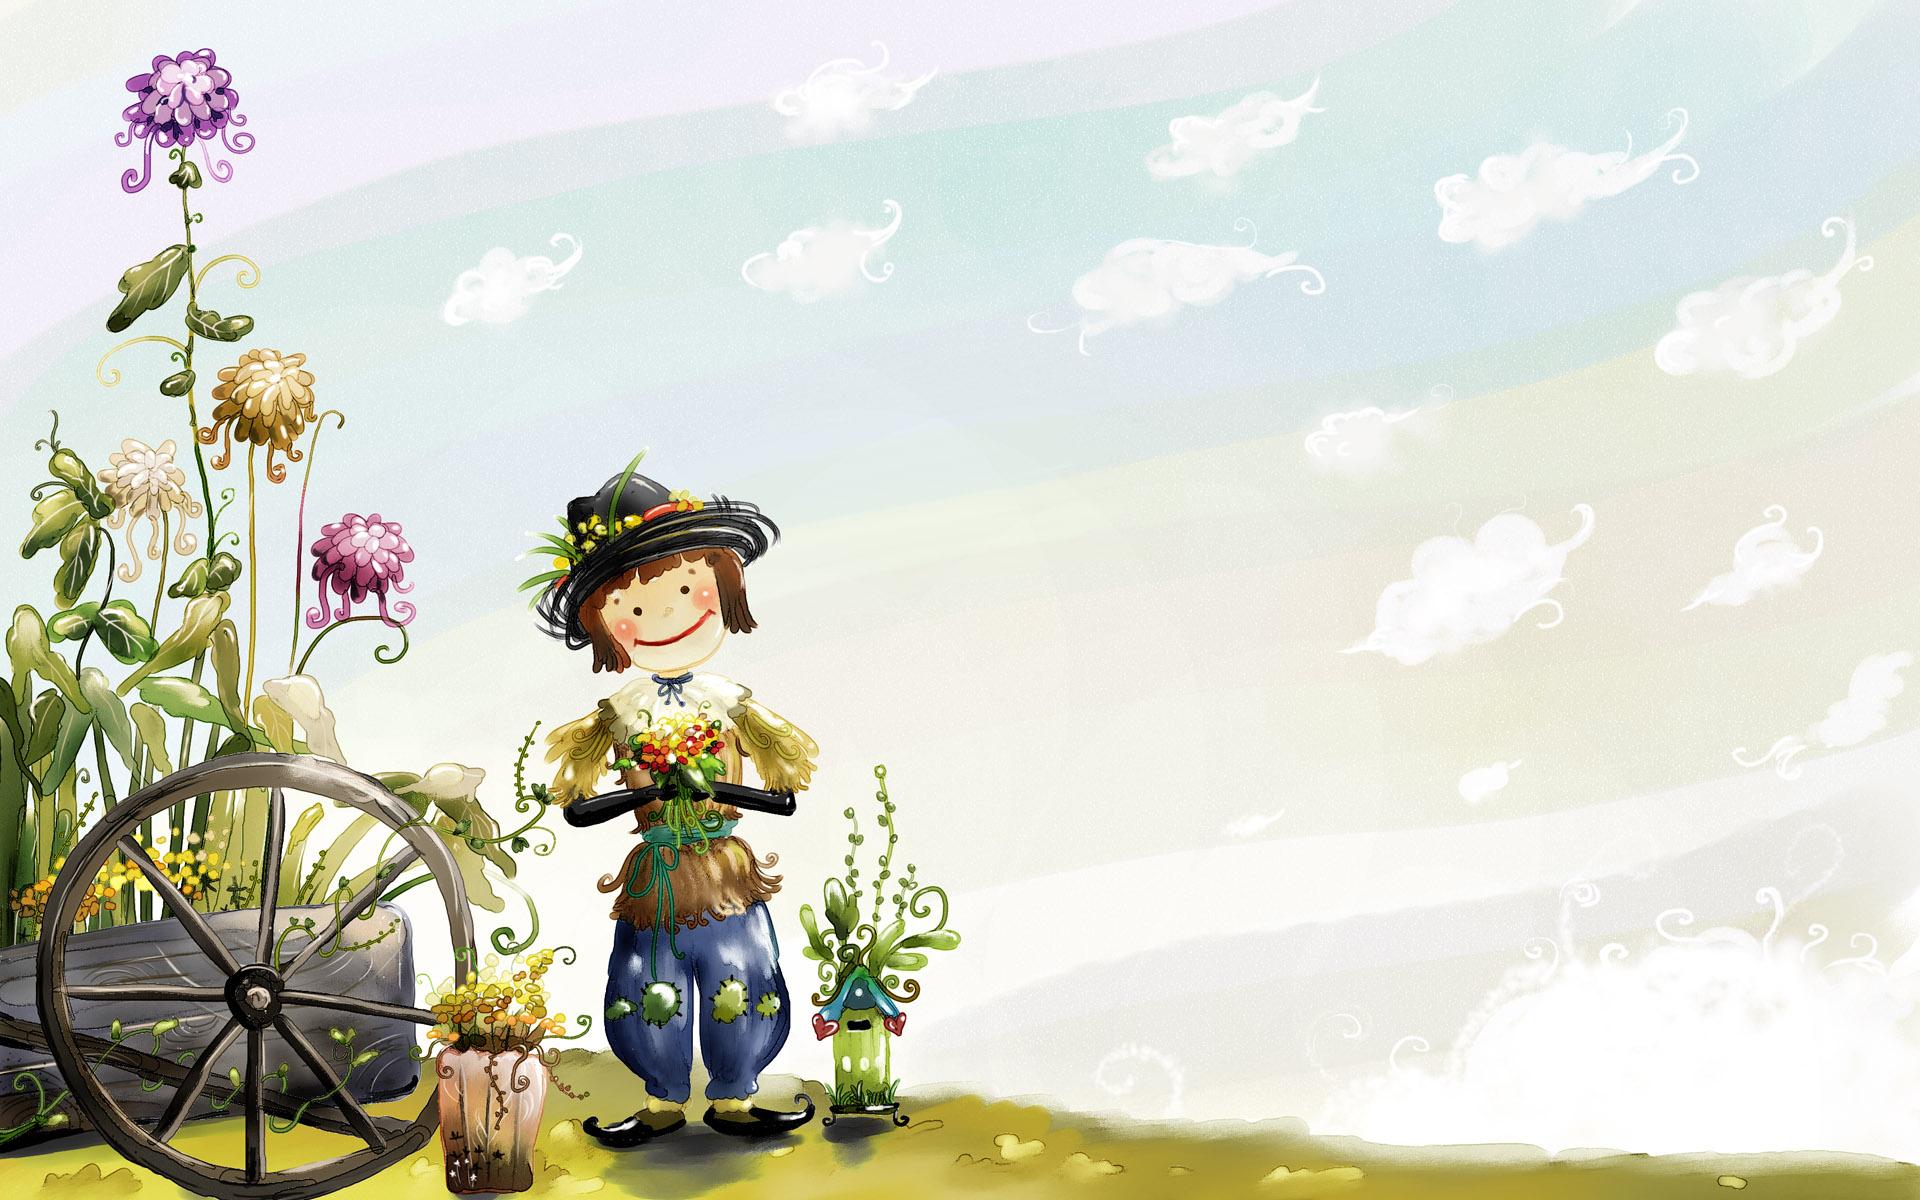 Flower Doll Funny Cartoon Desktop Wallpaper HD Desktop Wallpaper 1920x1200